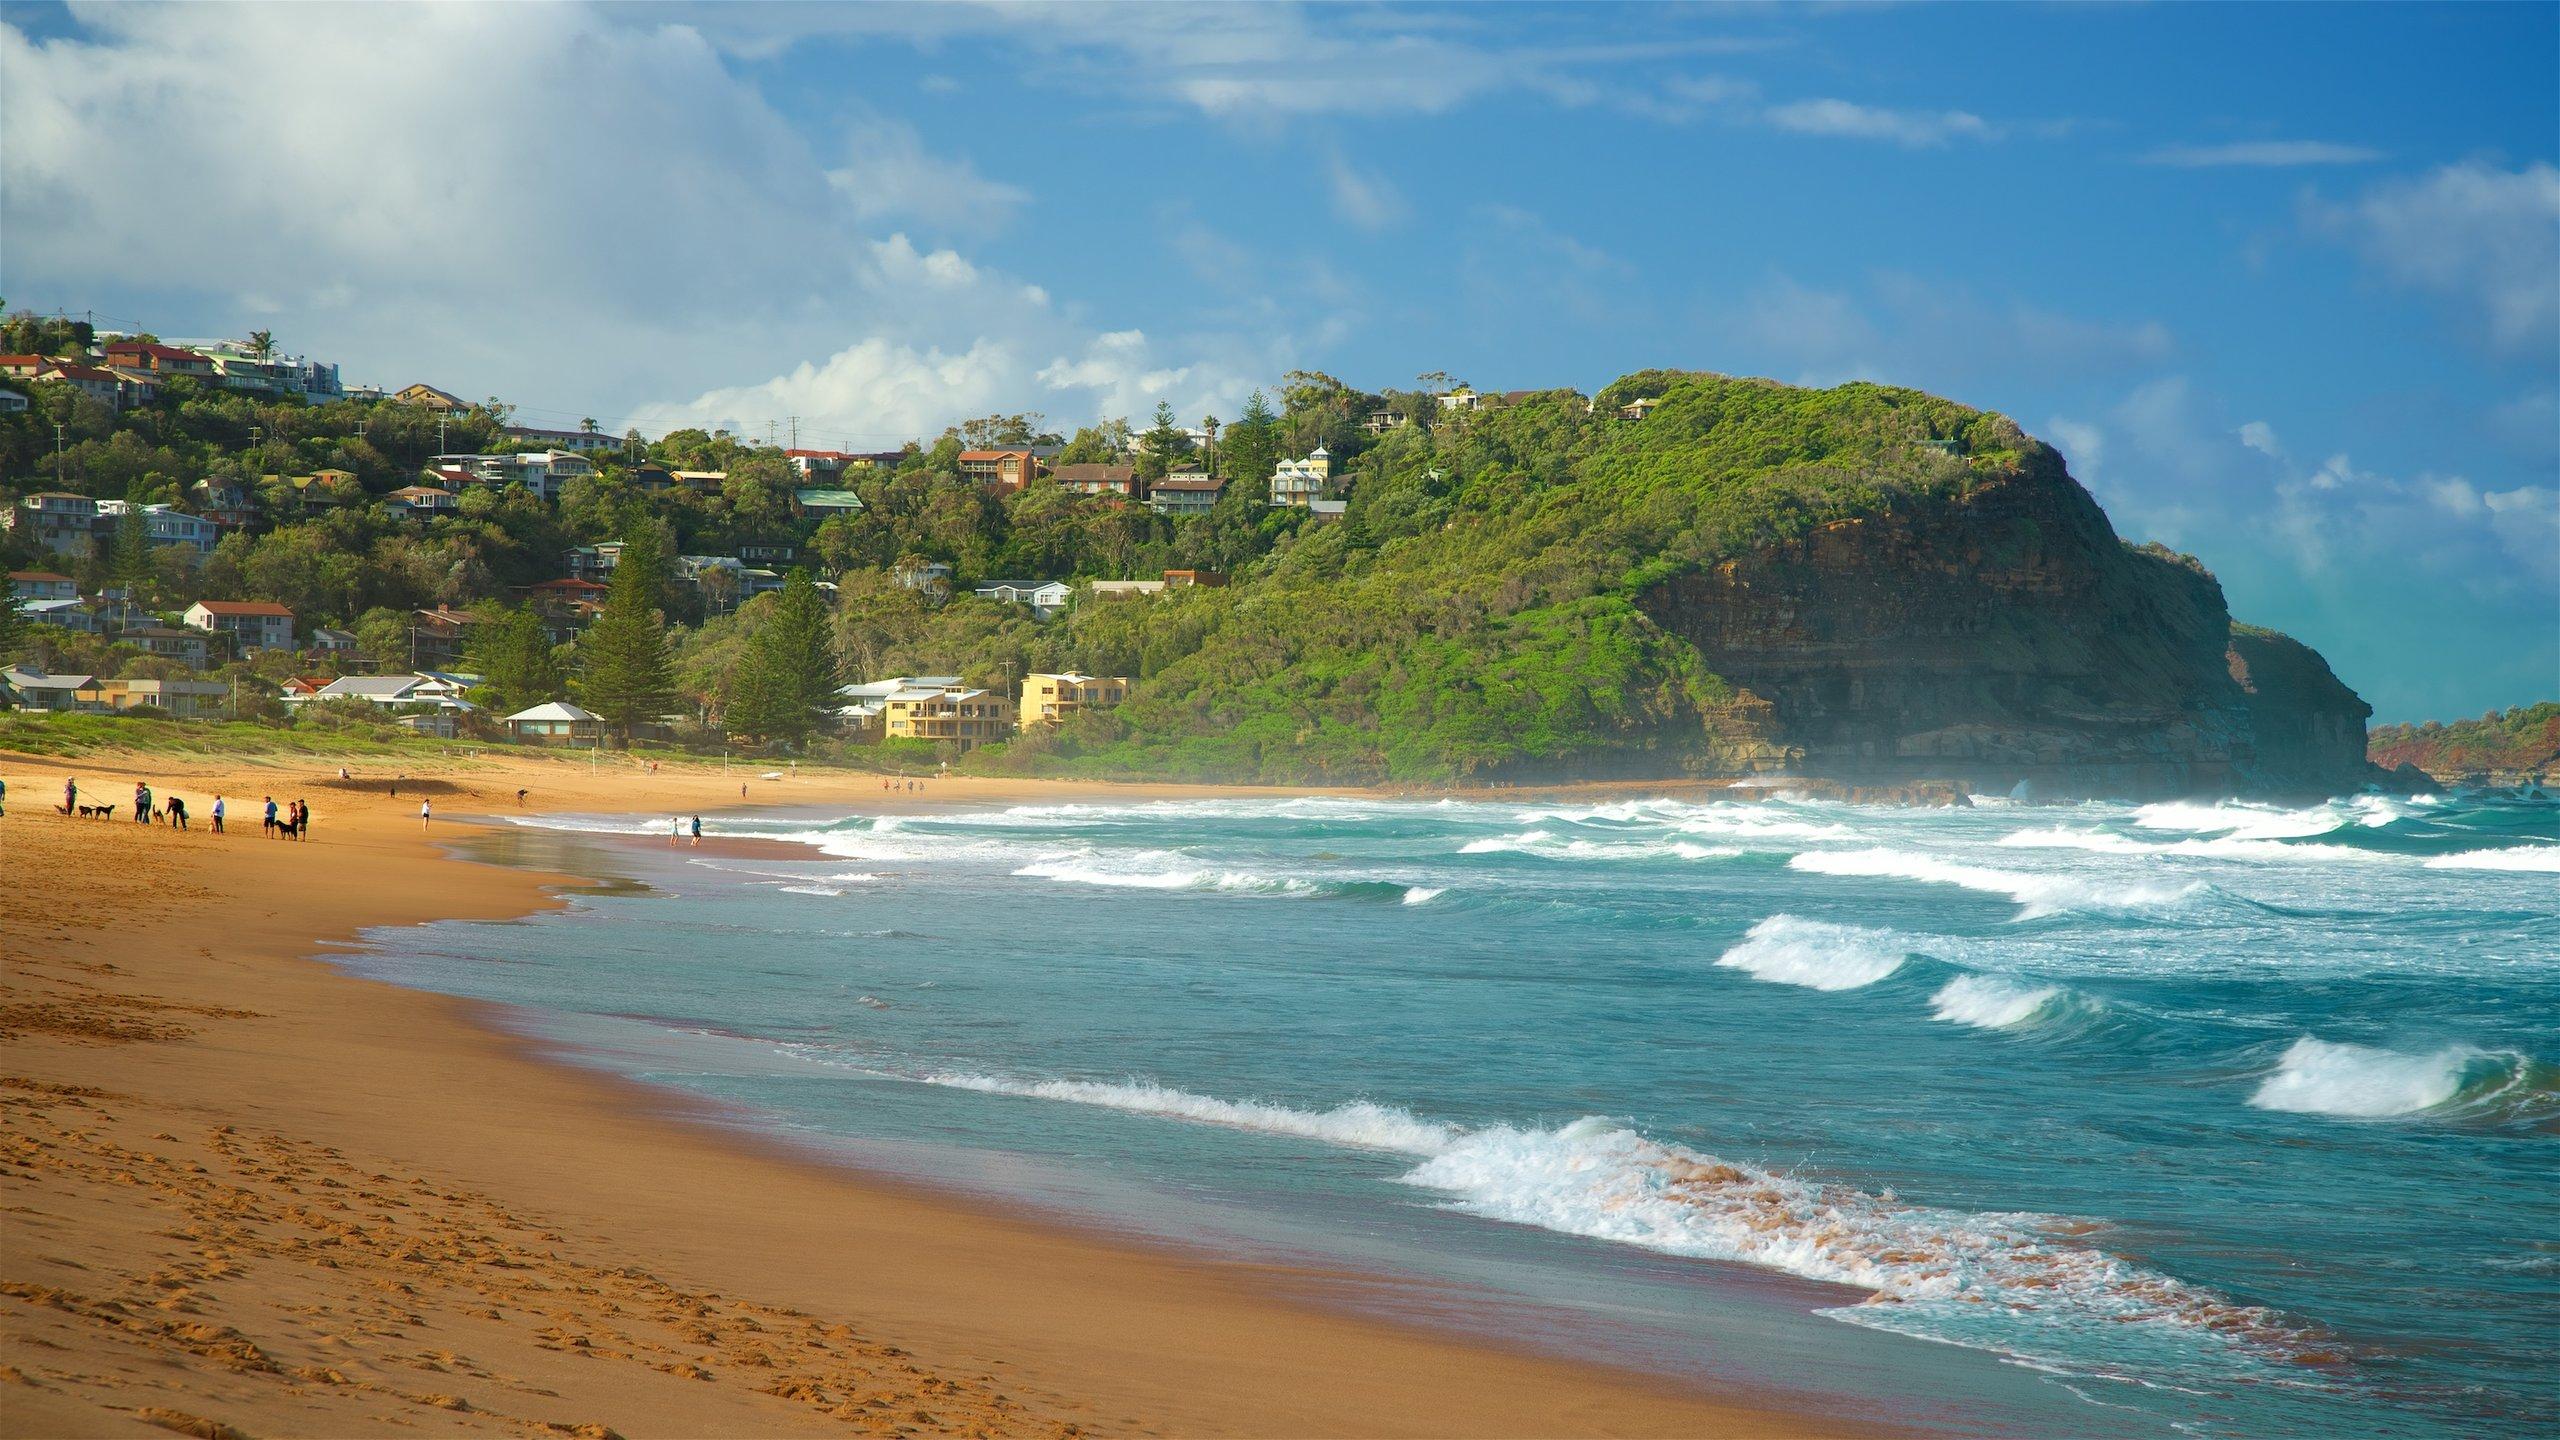 Avoca Beach, New South Wales, Australia